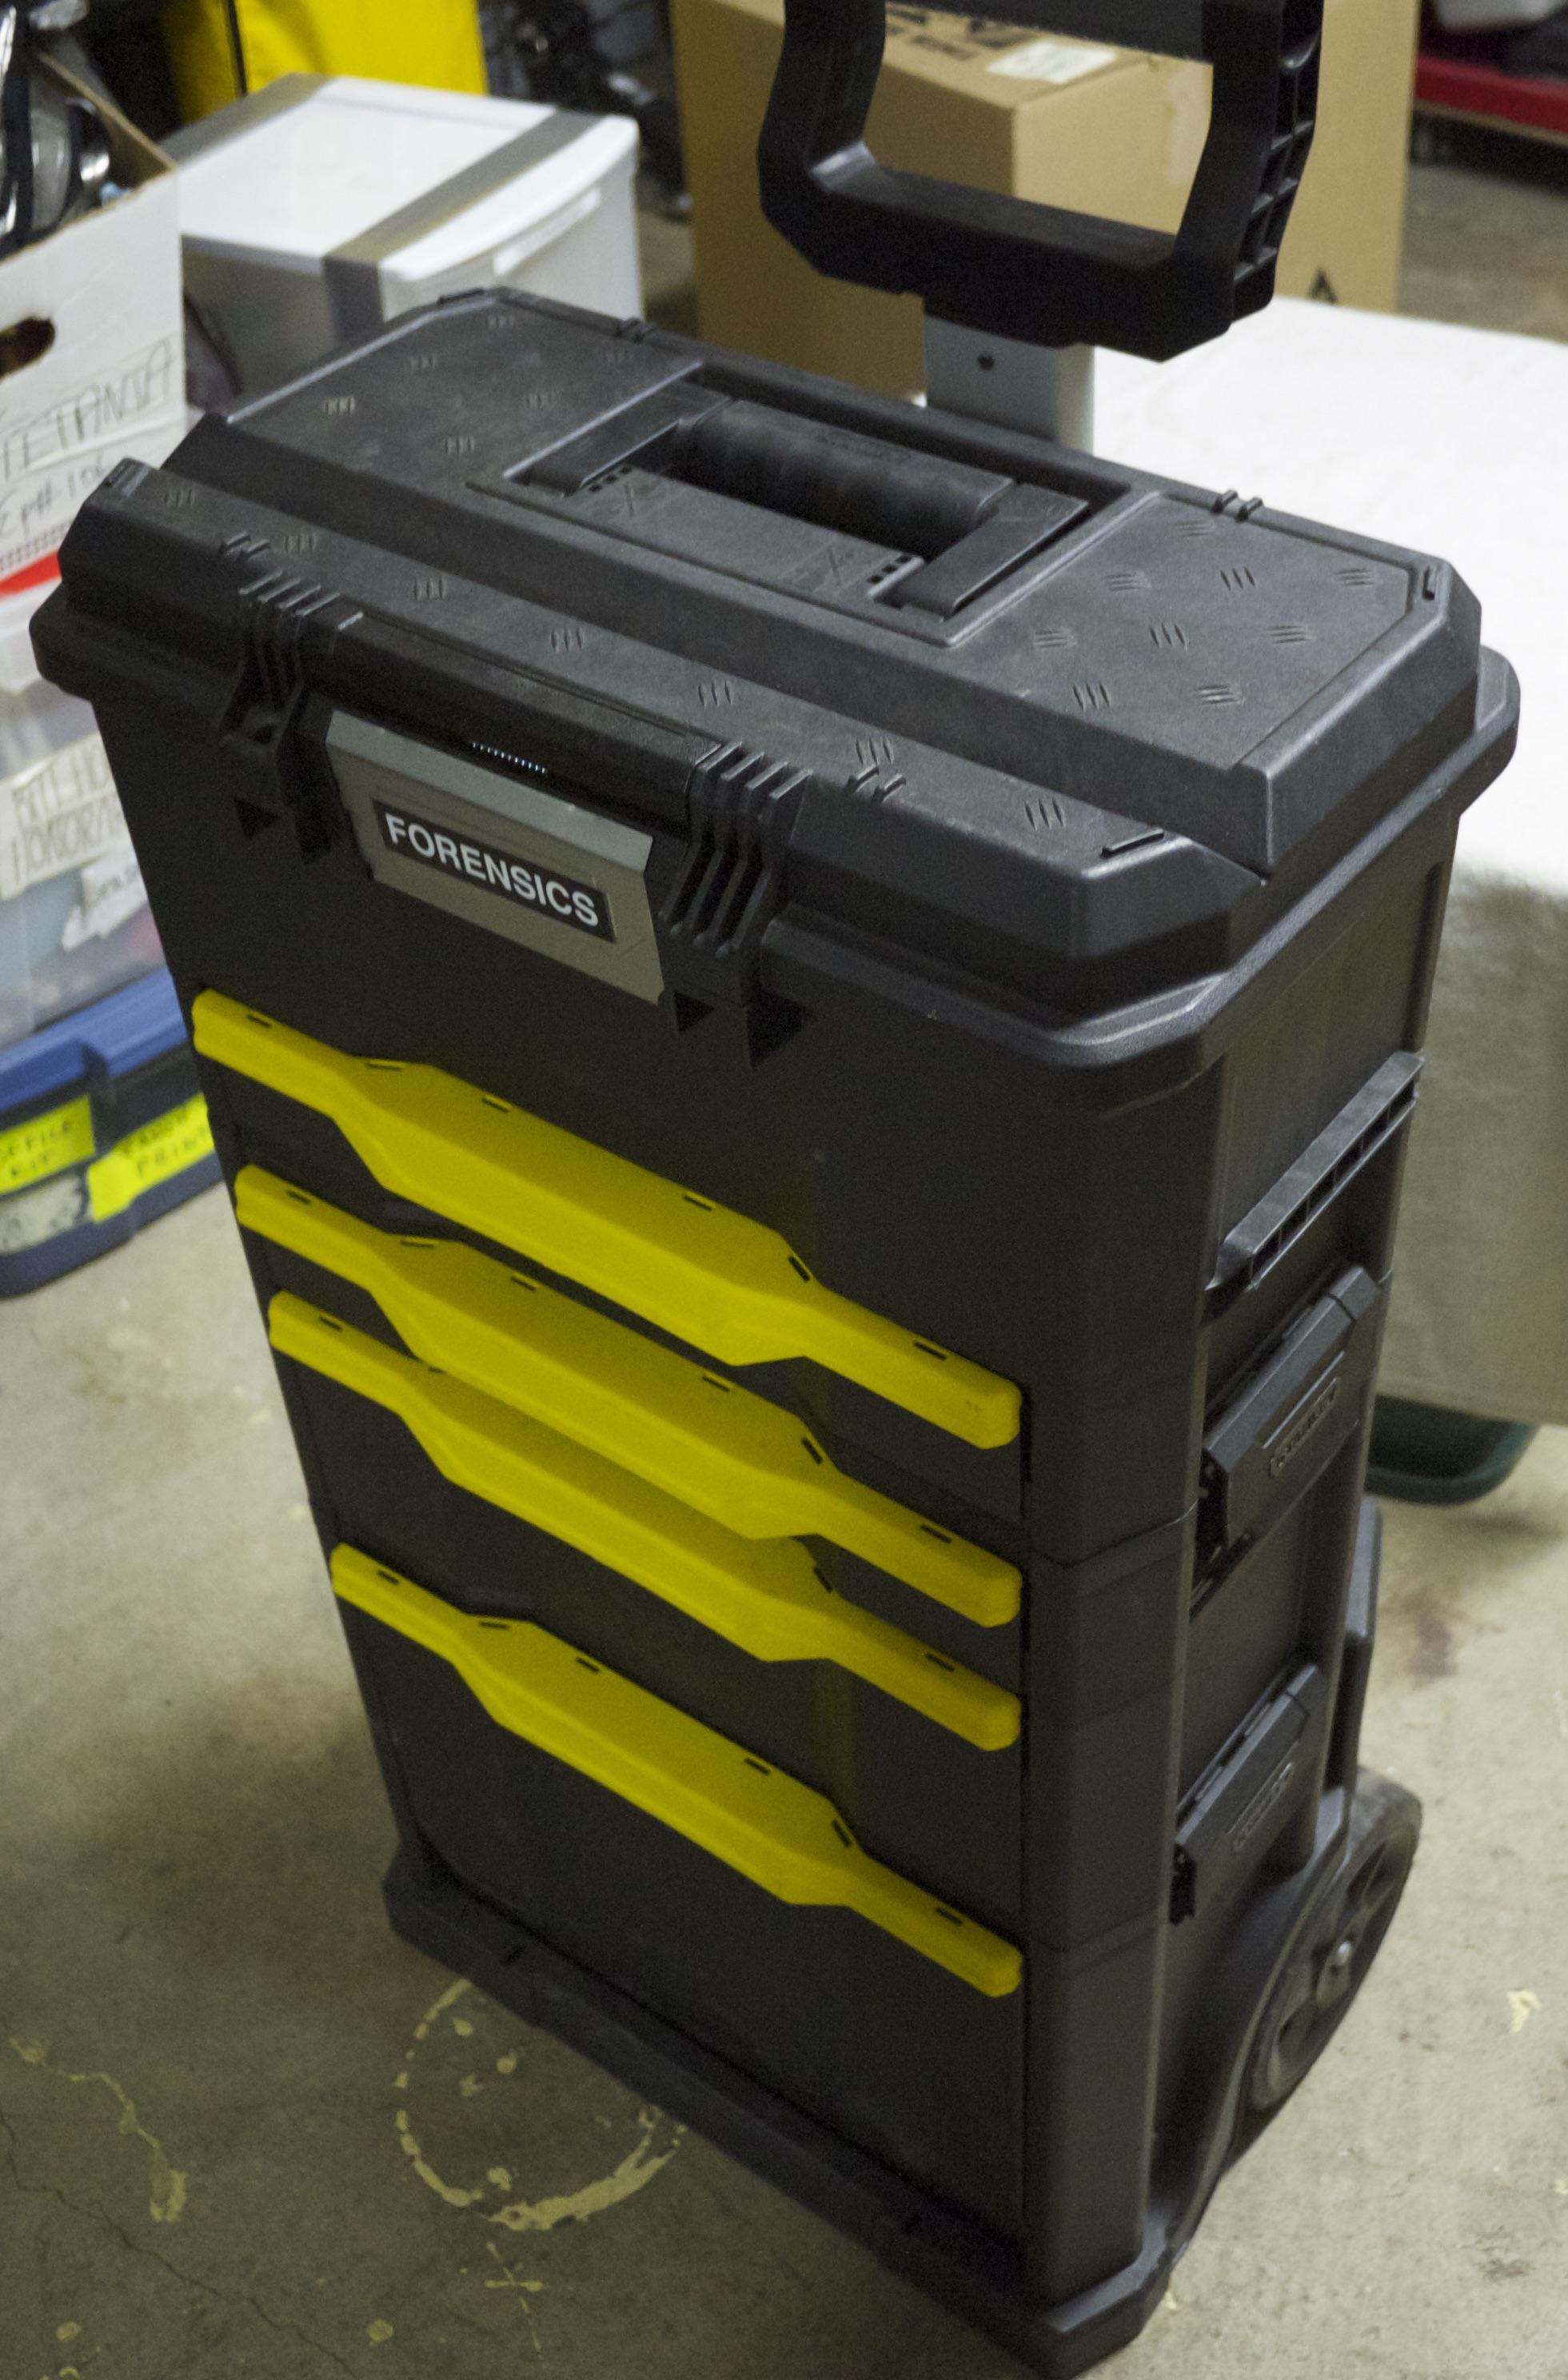 Forensics trunk